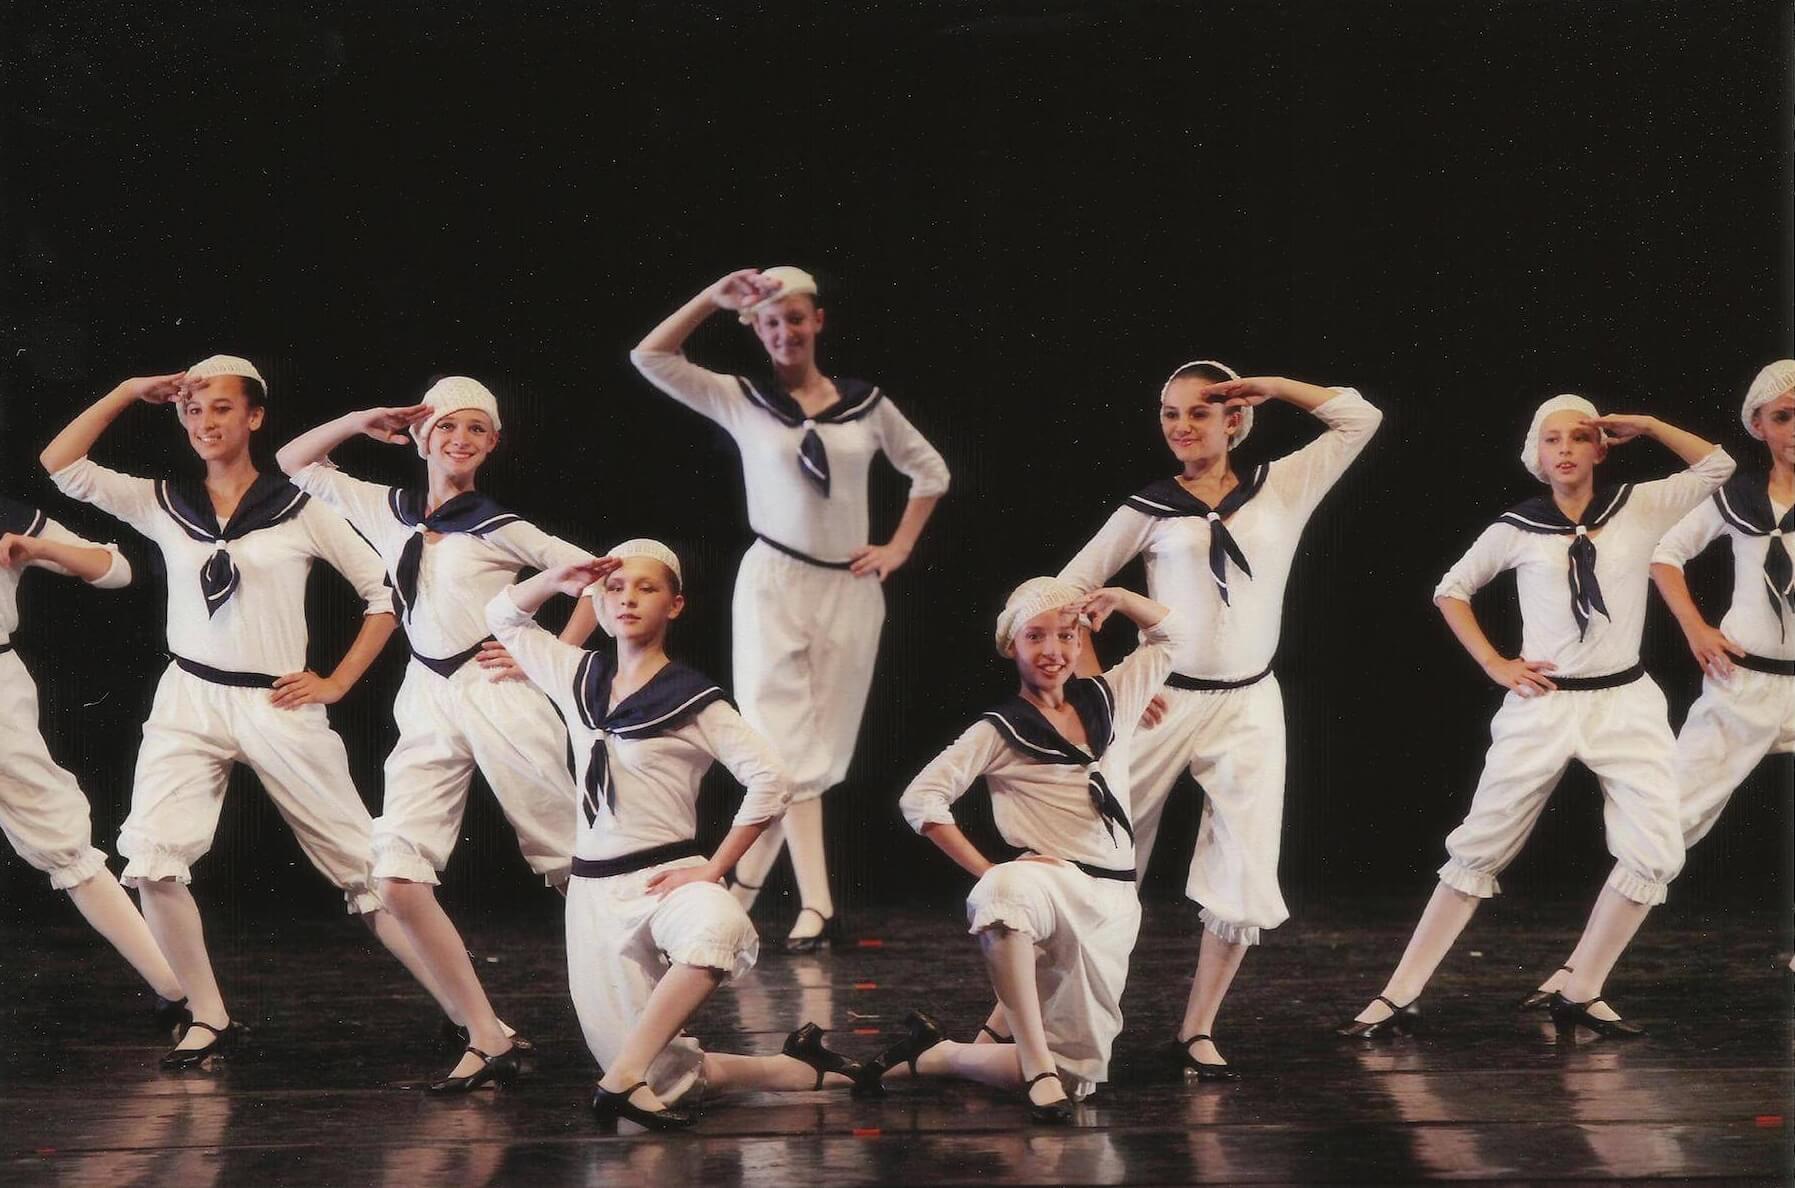 danza di carattere